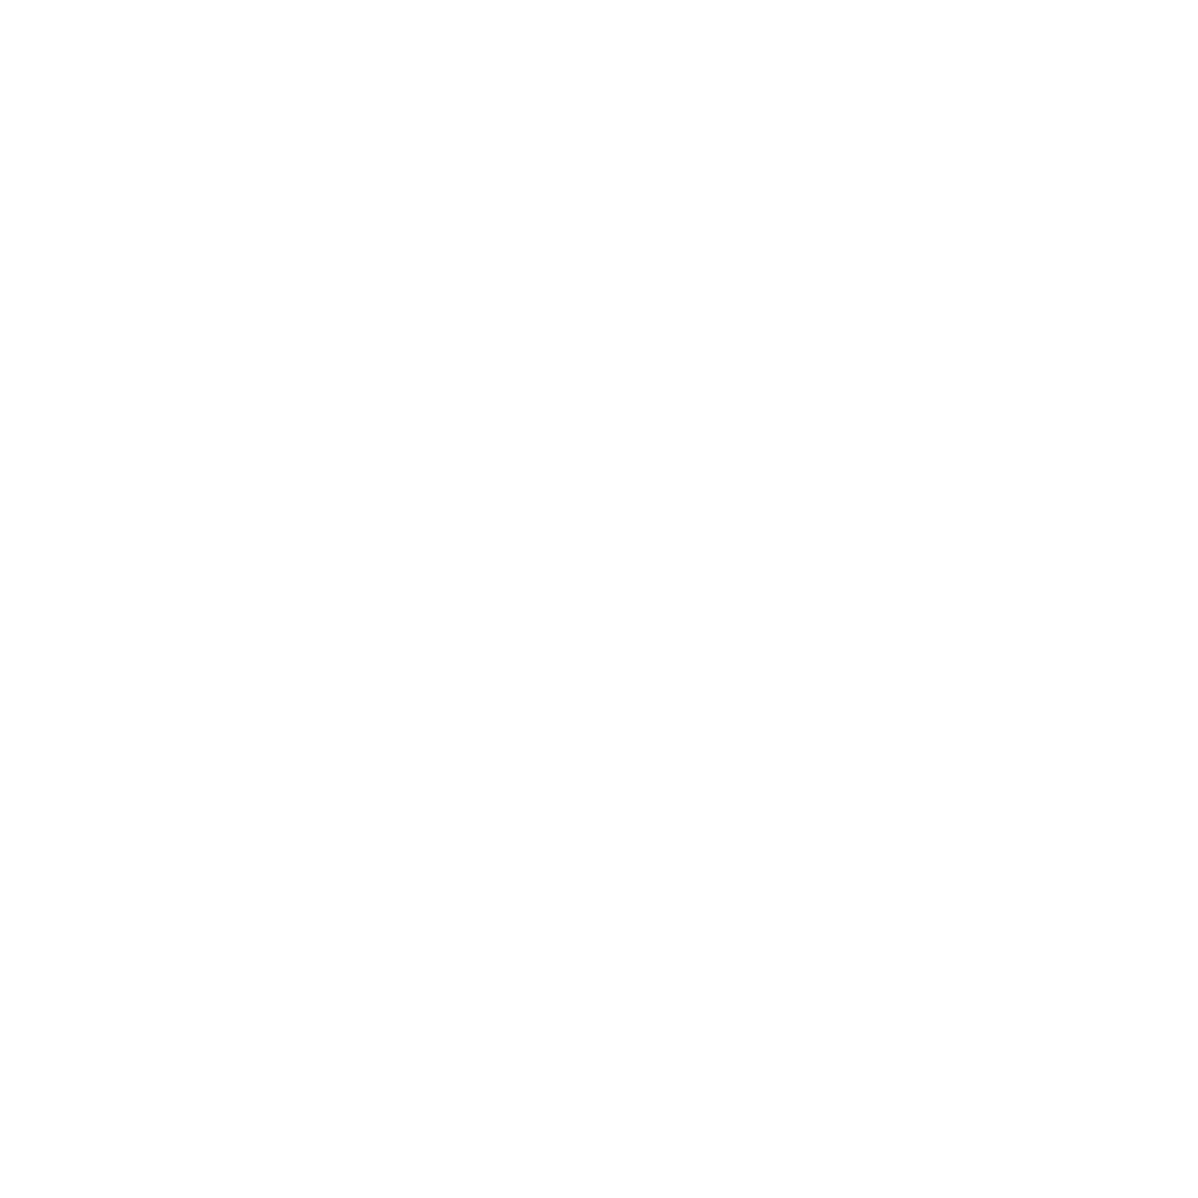 N.G.M.R- червено лого- черна раница